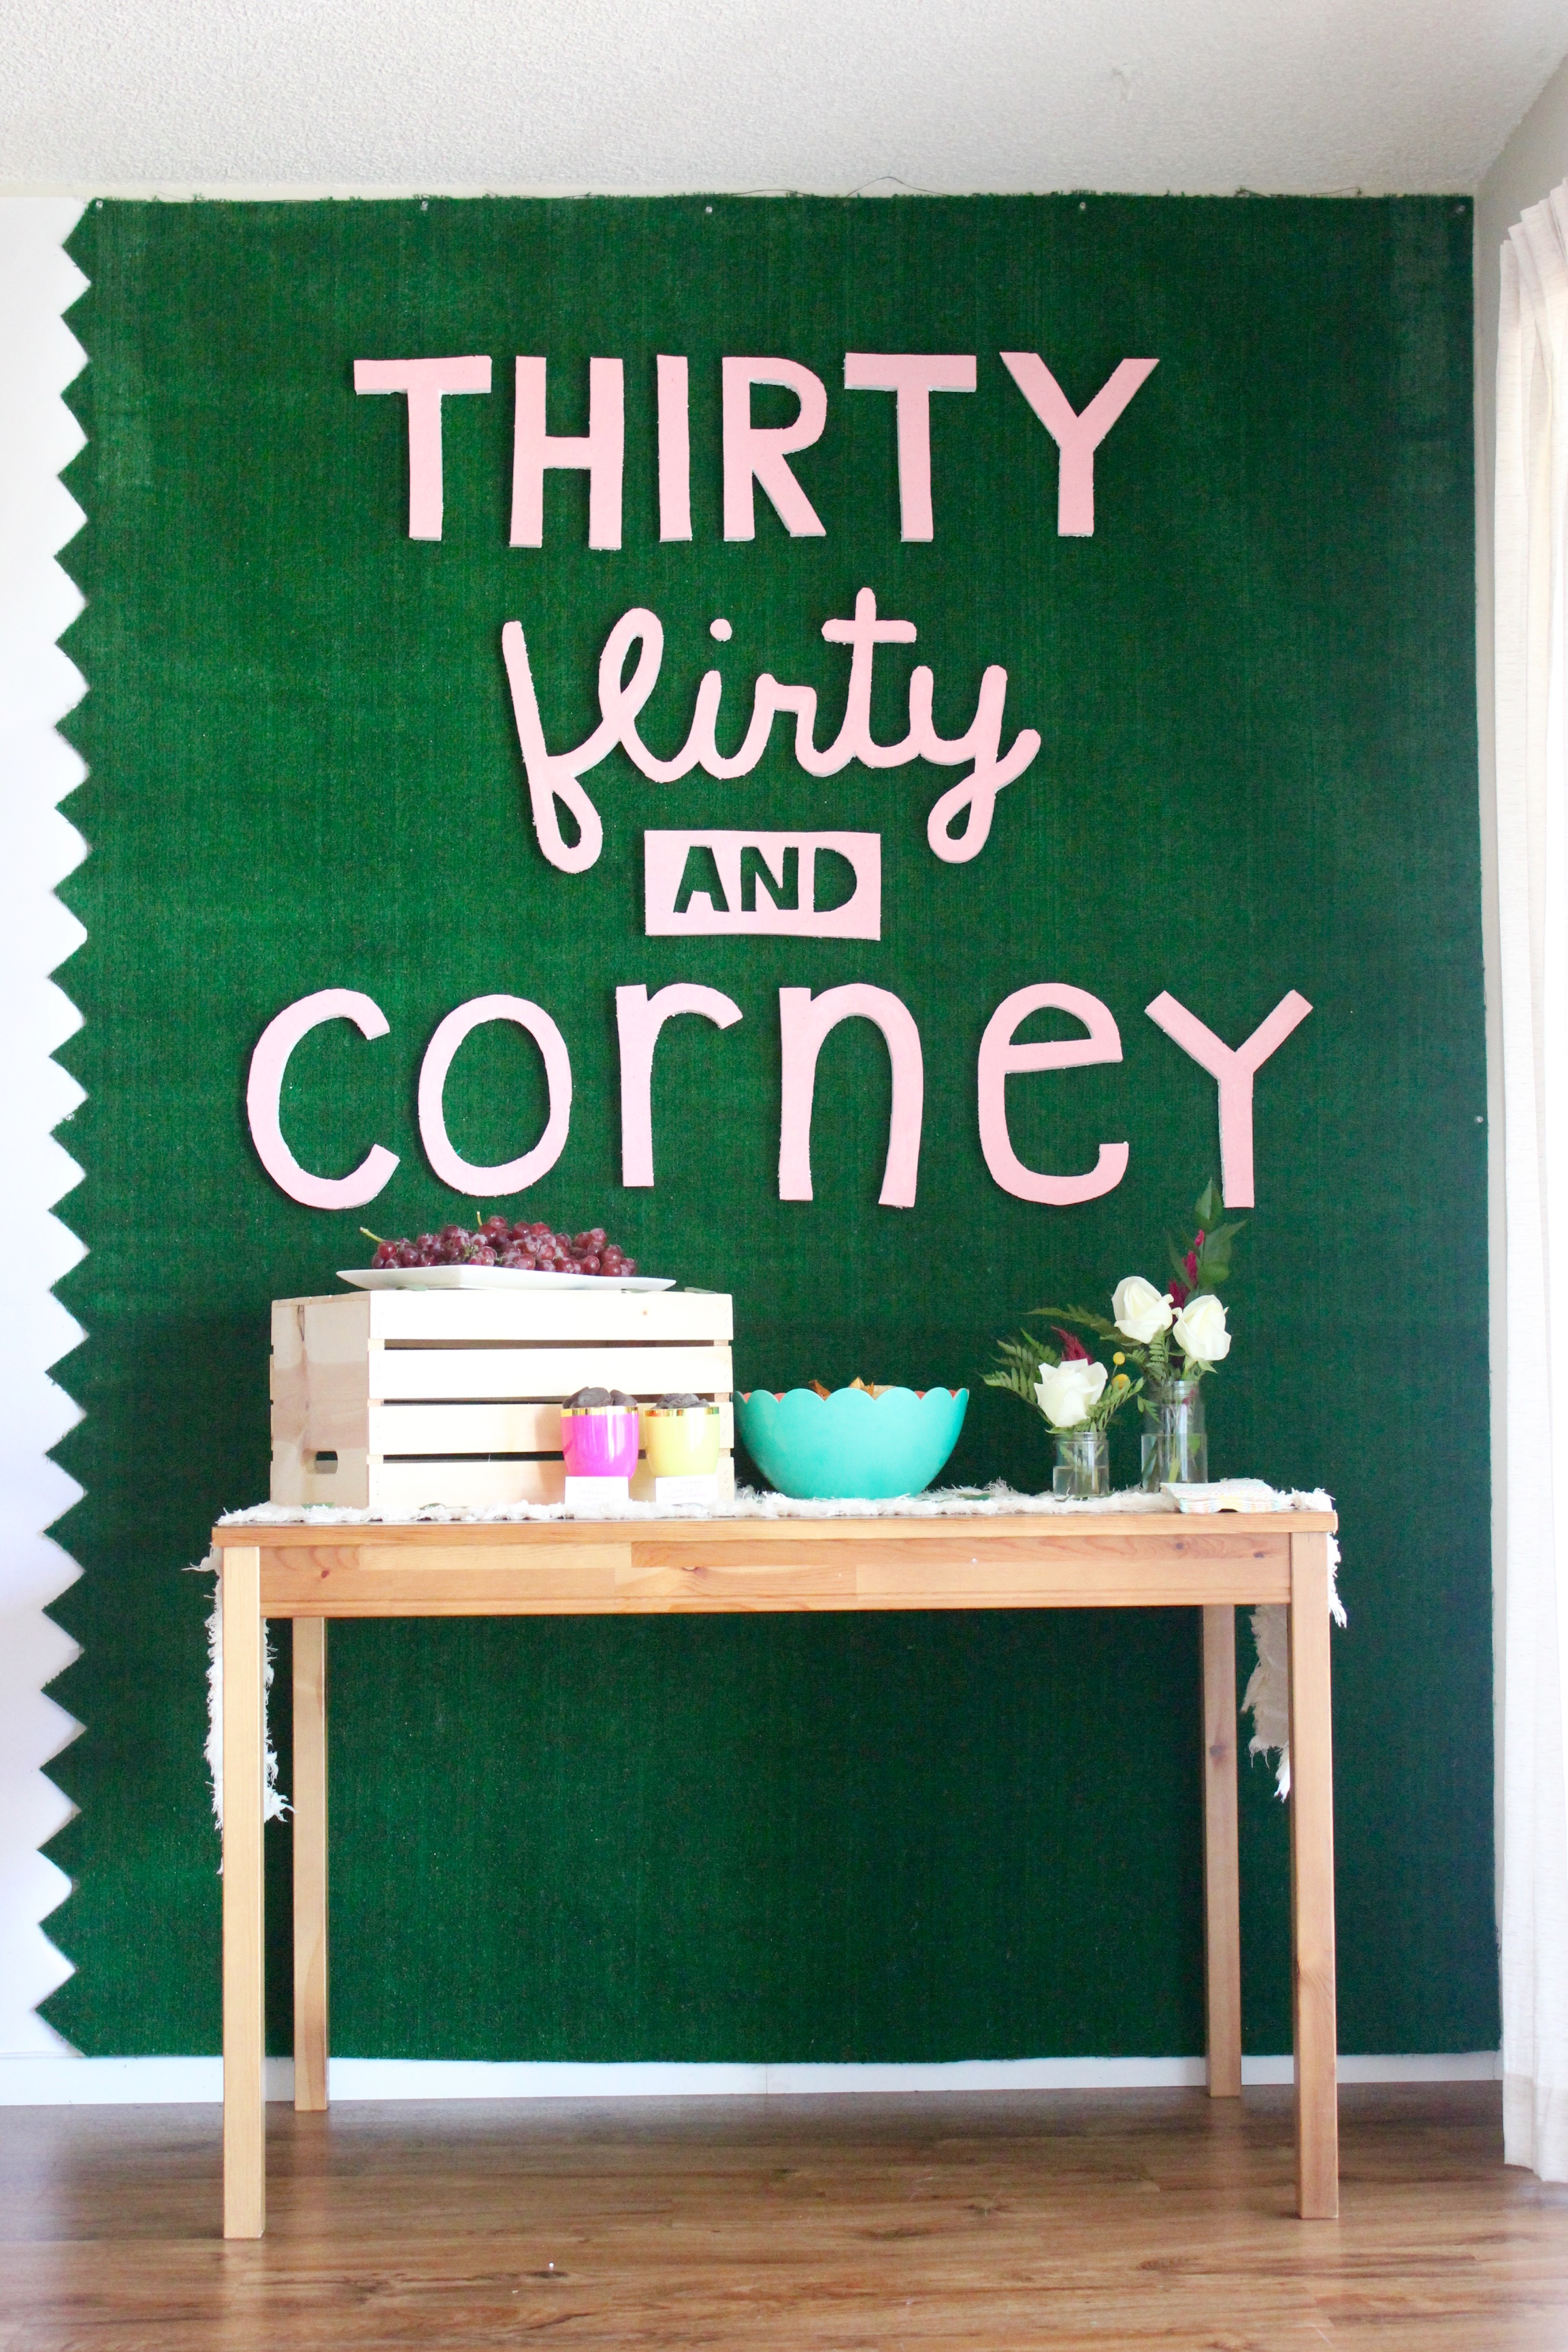 30 Flirty and Corney